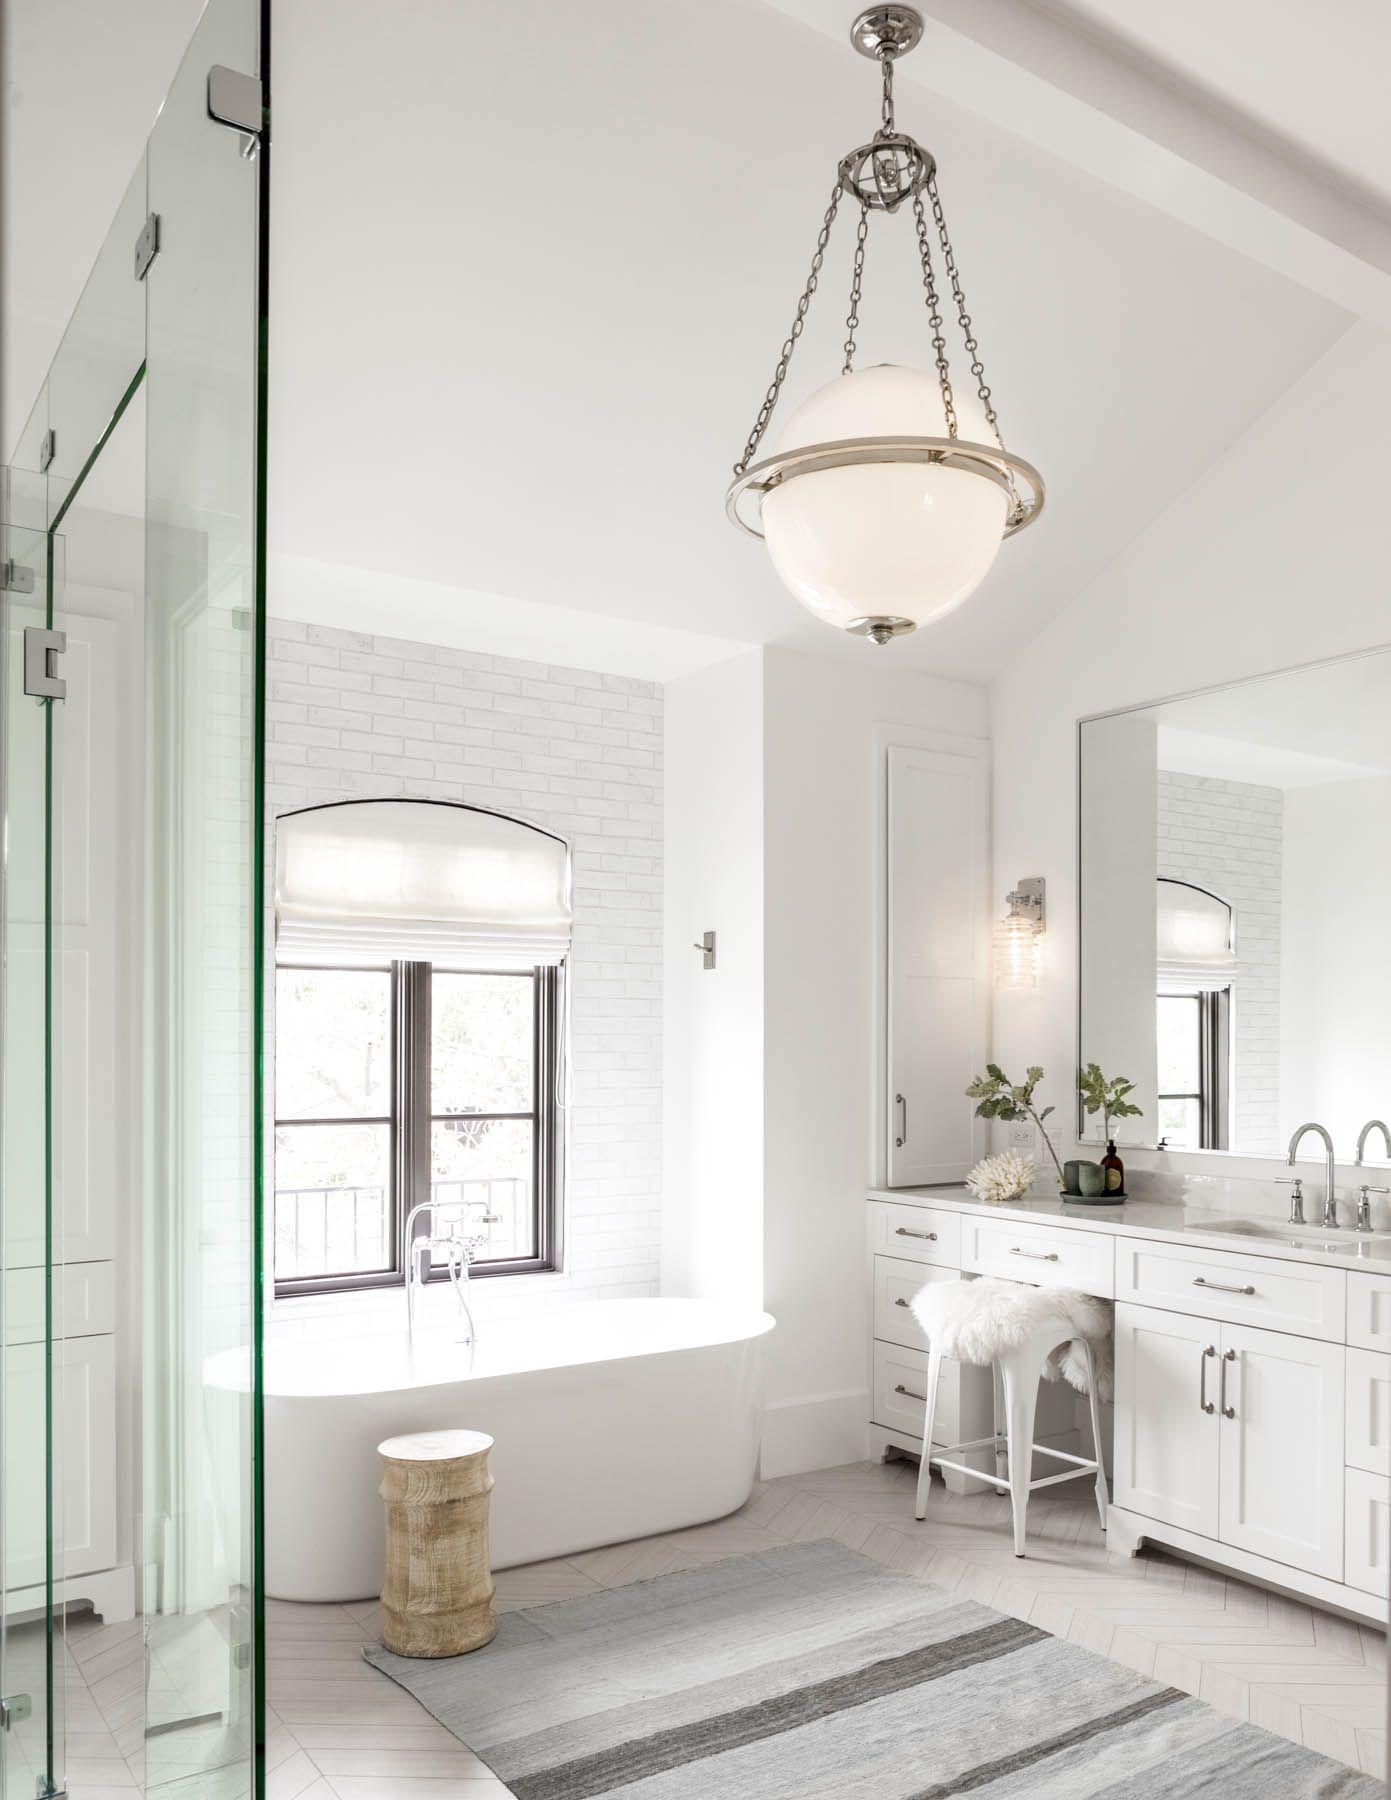 colgate image bathrooms pinterest dream shower bath